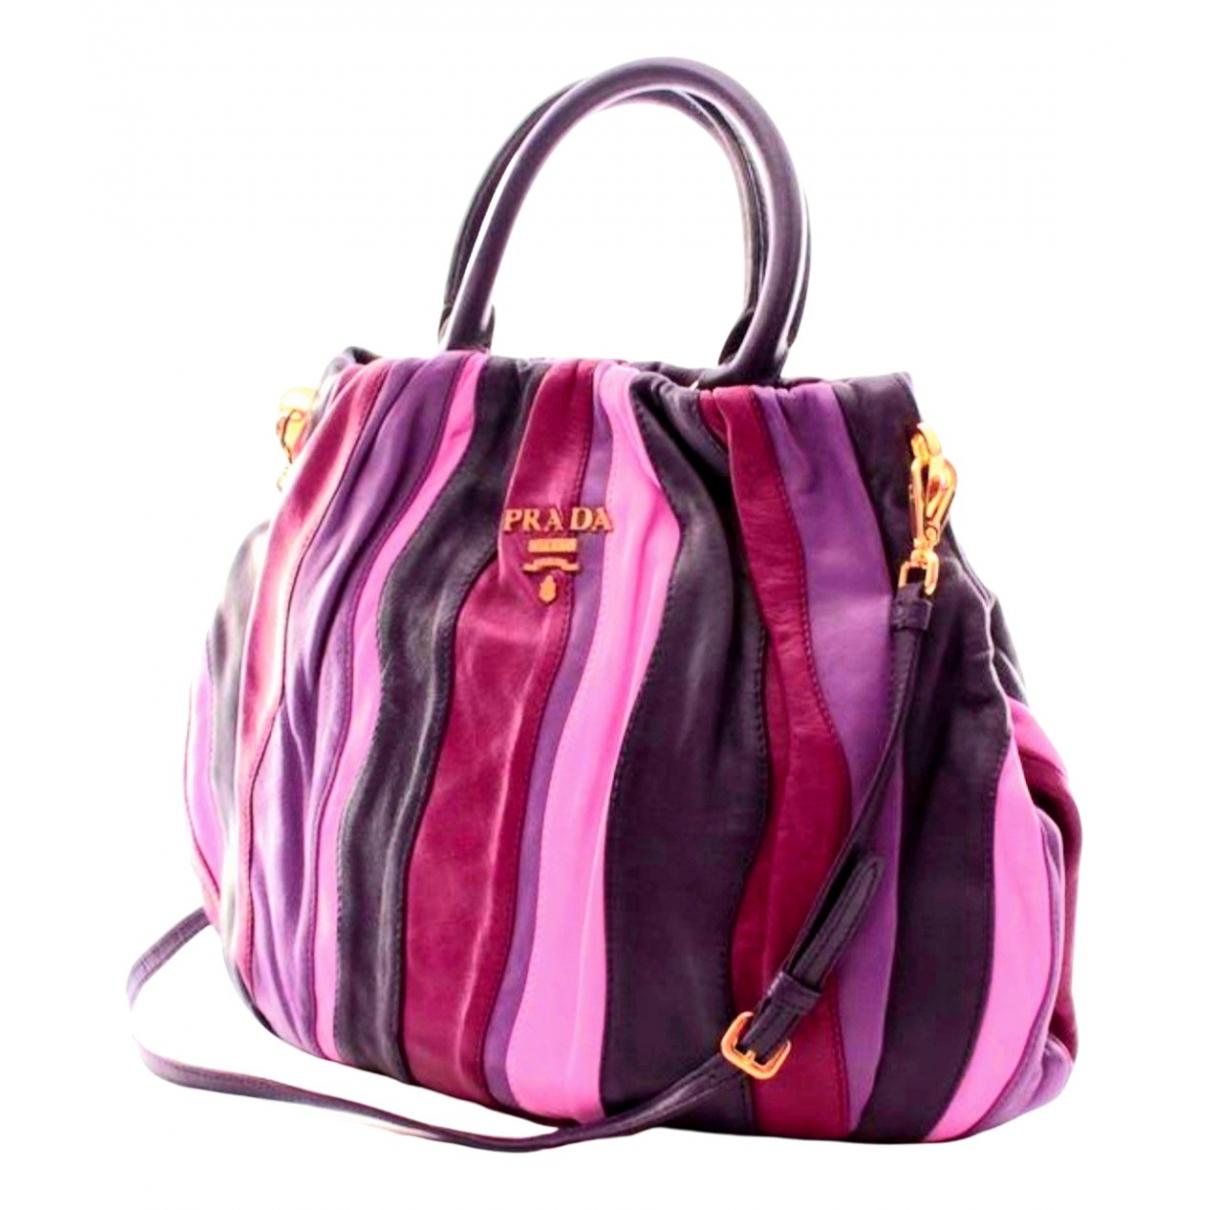 Prada \N Multicolour Leather handbag for Women \N